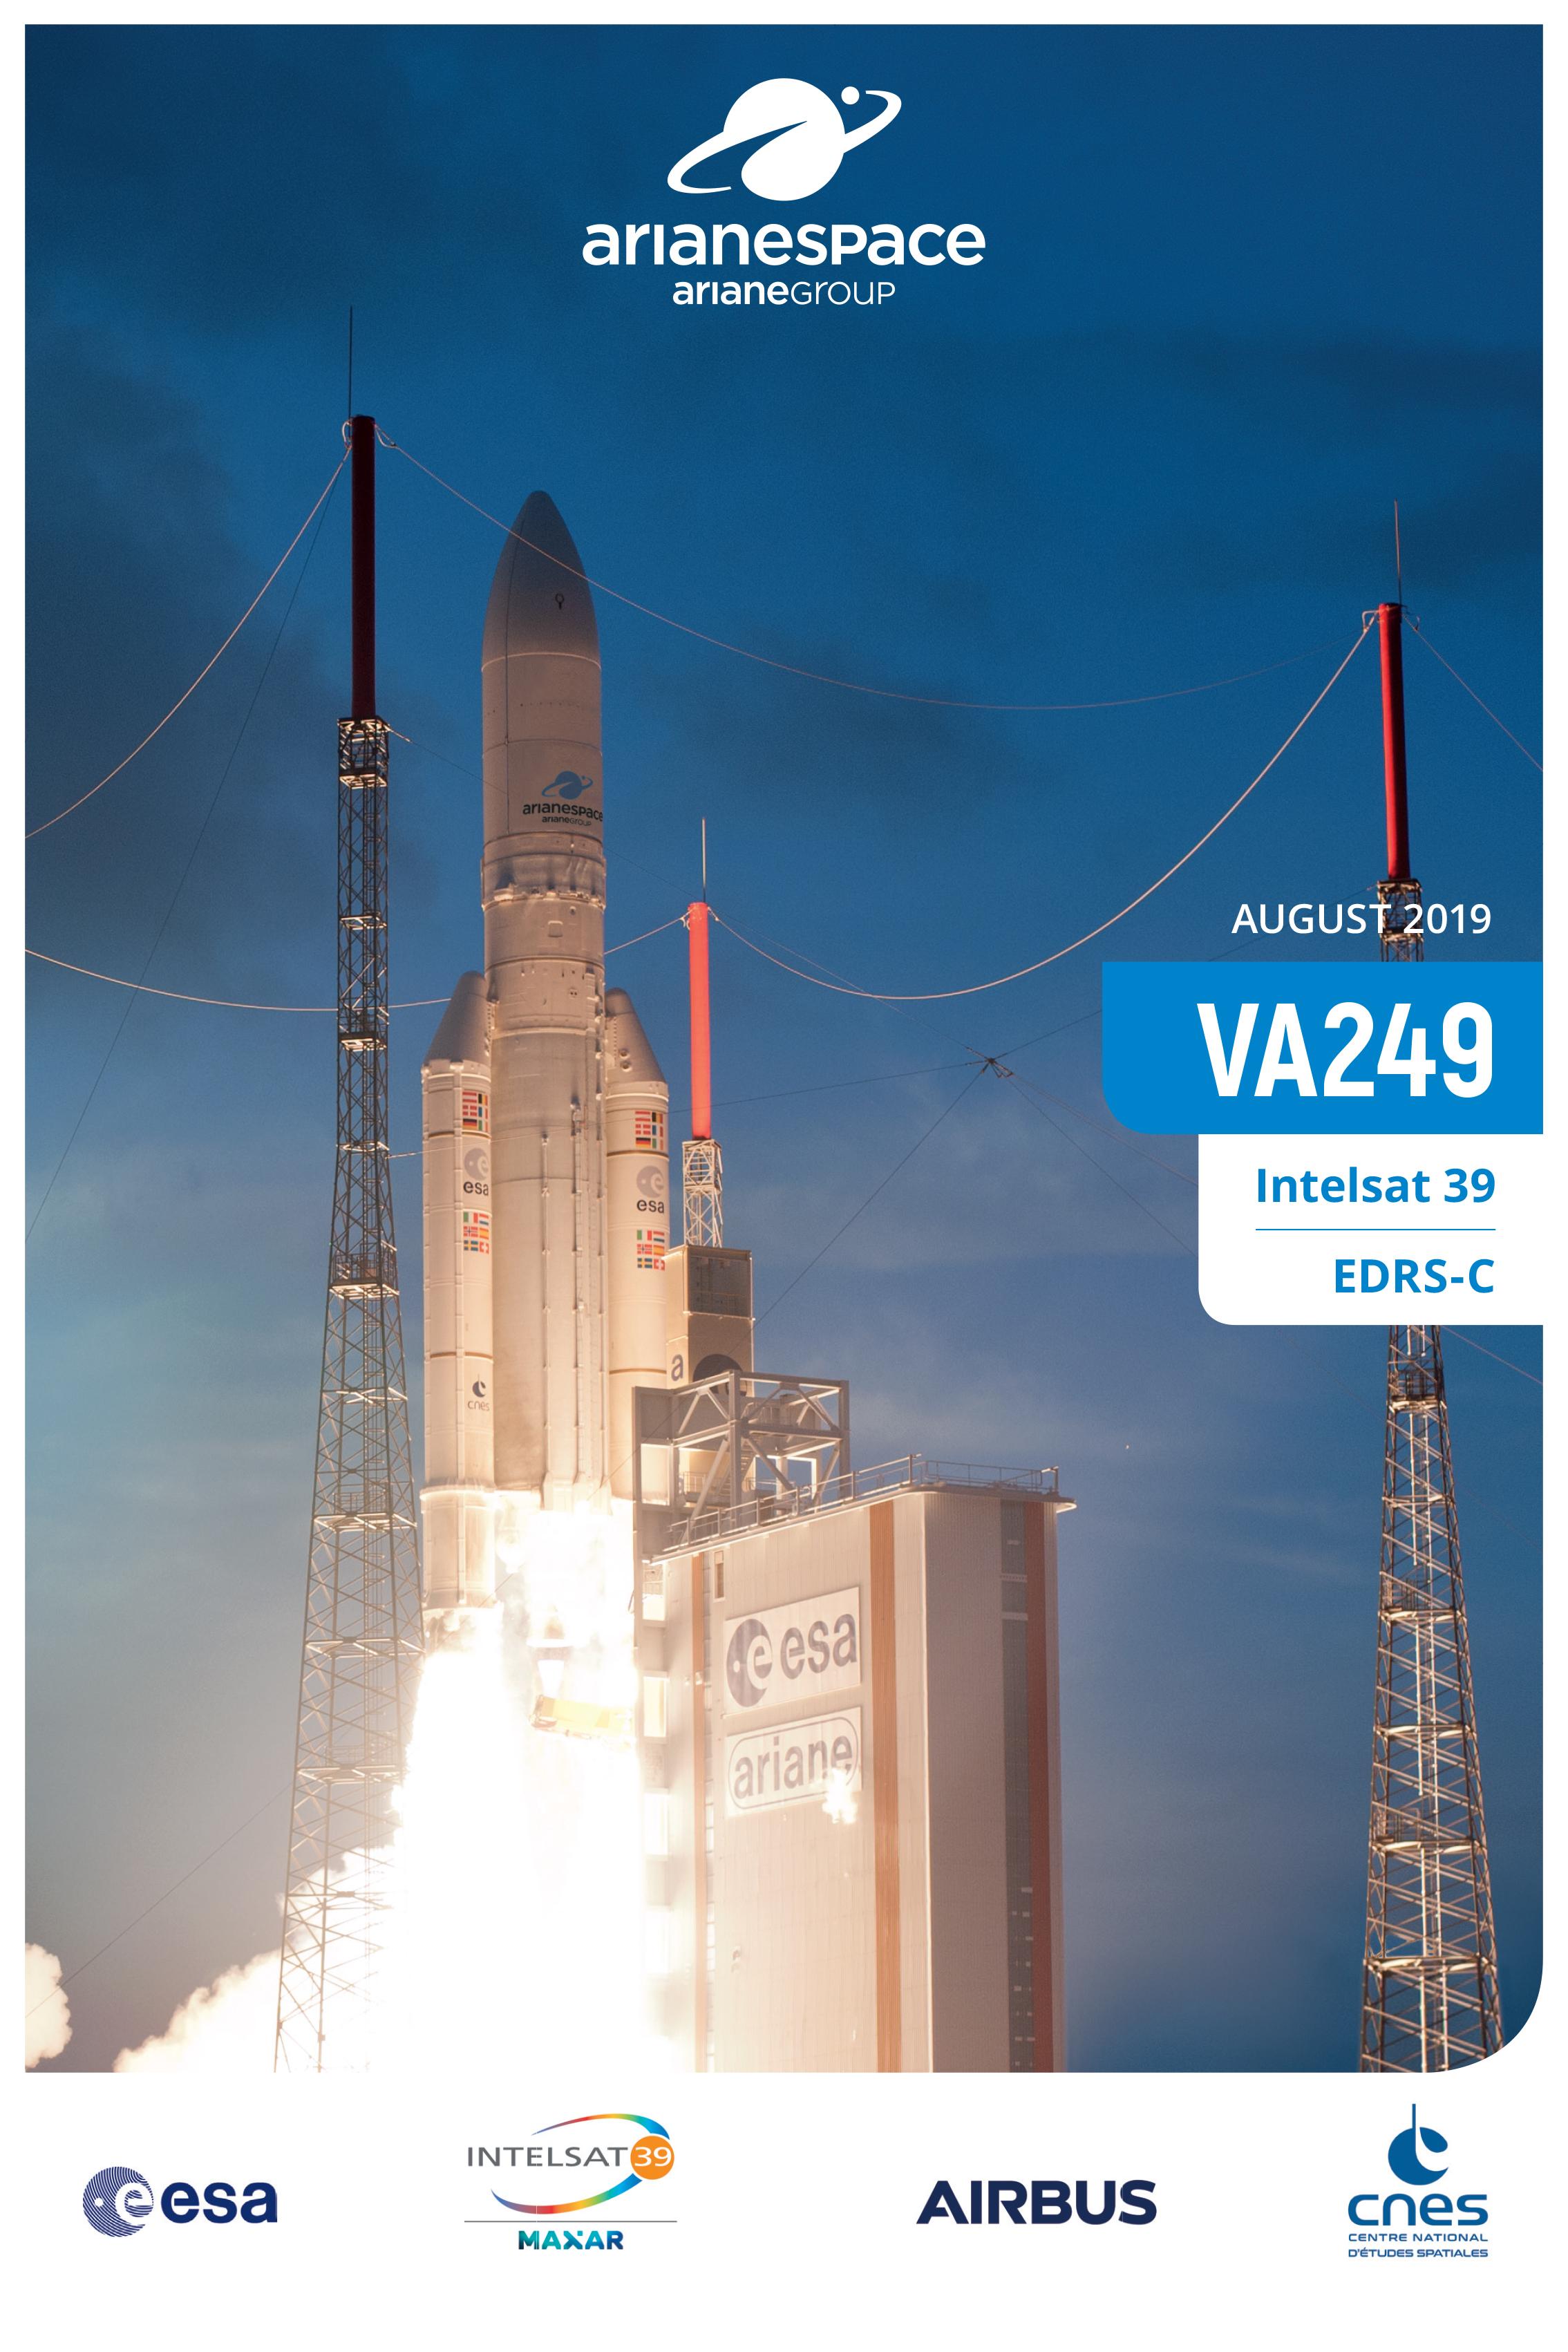 Launch kit cover  Flight VA249  Intelsat 39 and EDRS-C